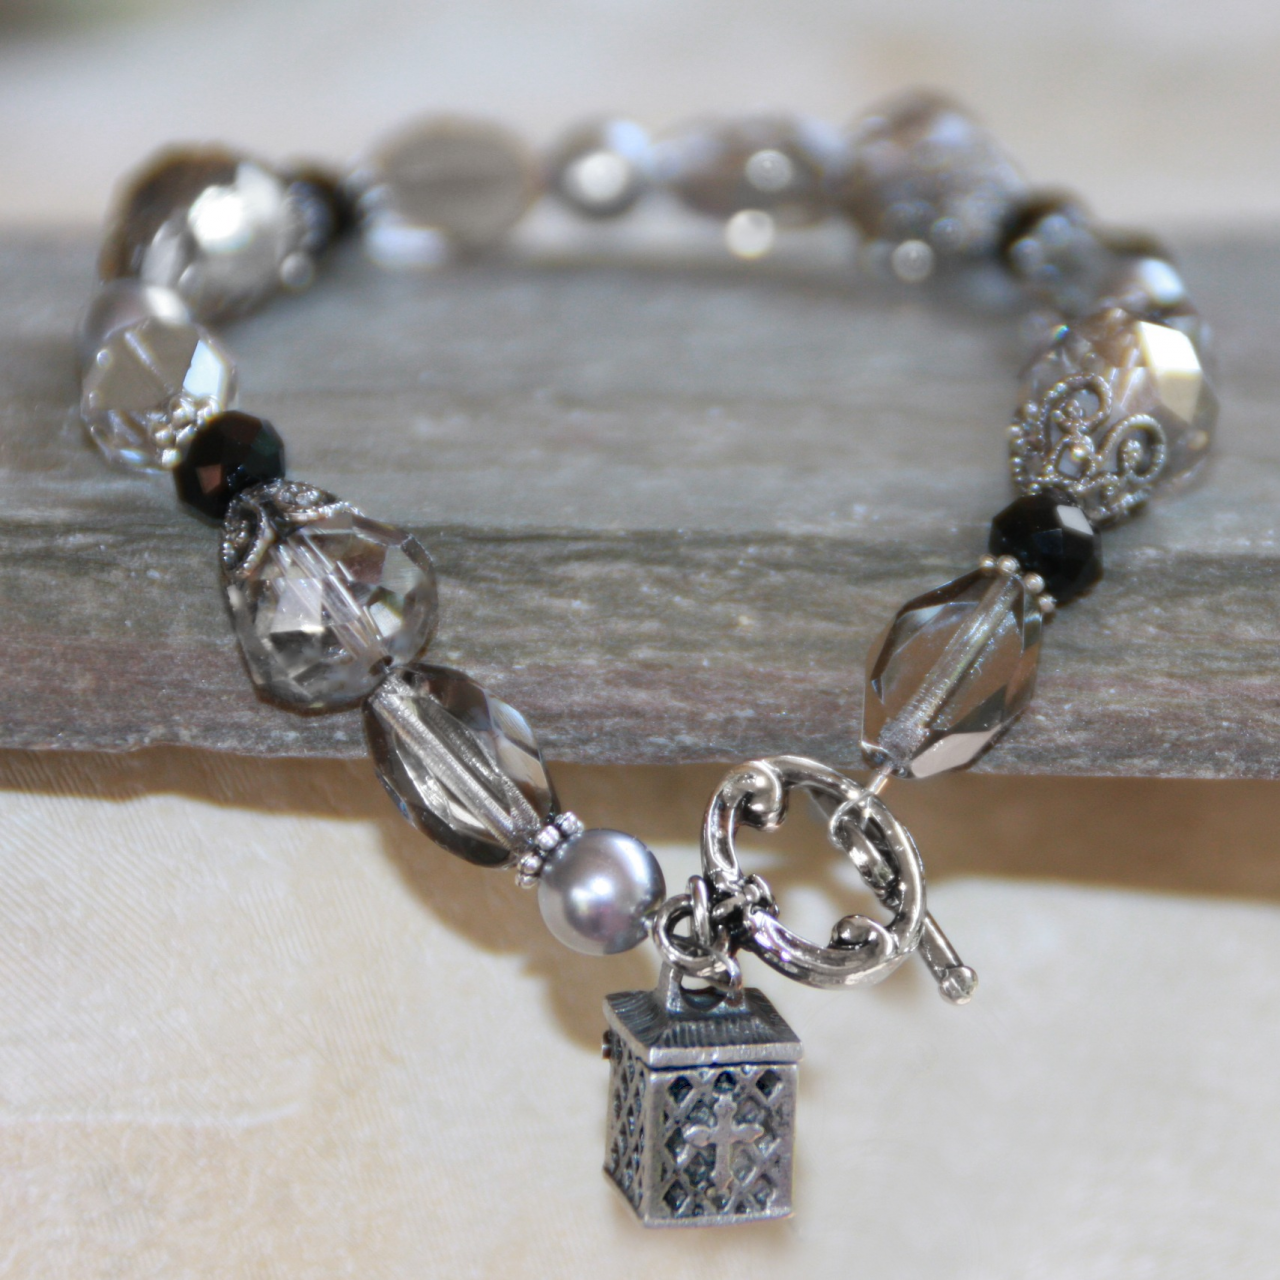 Pearl Prayer Box Bracelet prayer box, bracelet, jewelry, message bracelet, prayer bracelet, in-354